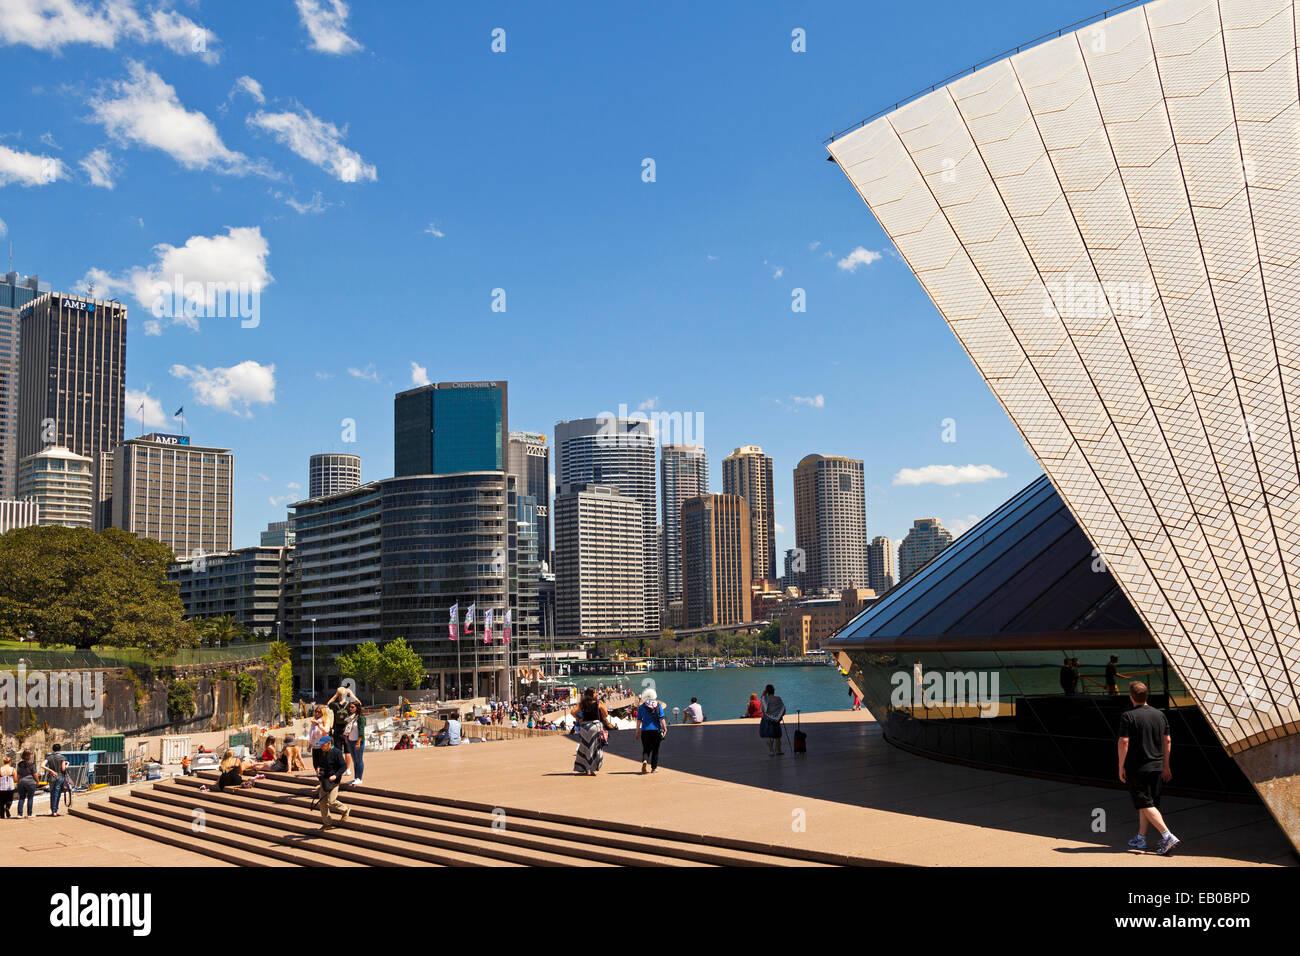 Circular Quay Sydney NSW Australia - Stock Image